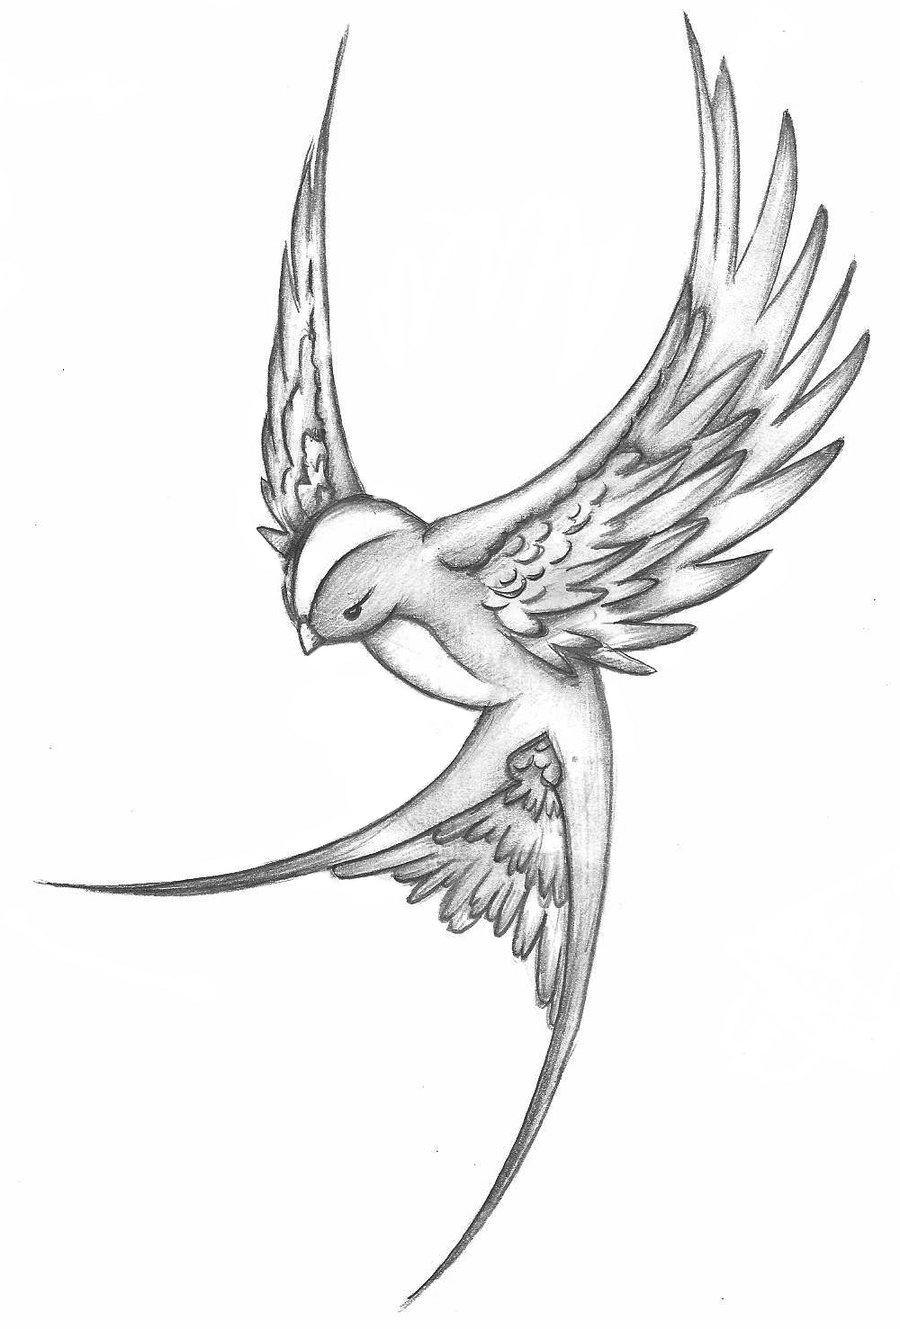 killer celtic dragon tattoo 11795 inspirational tattoos